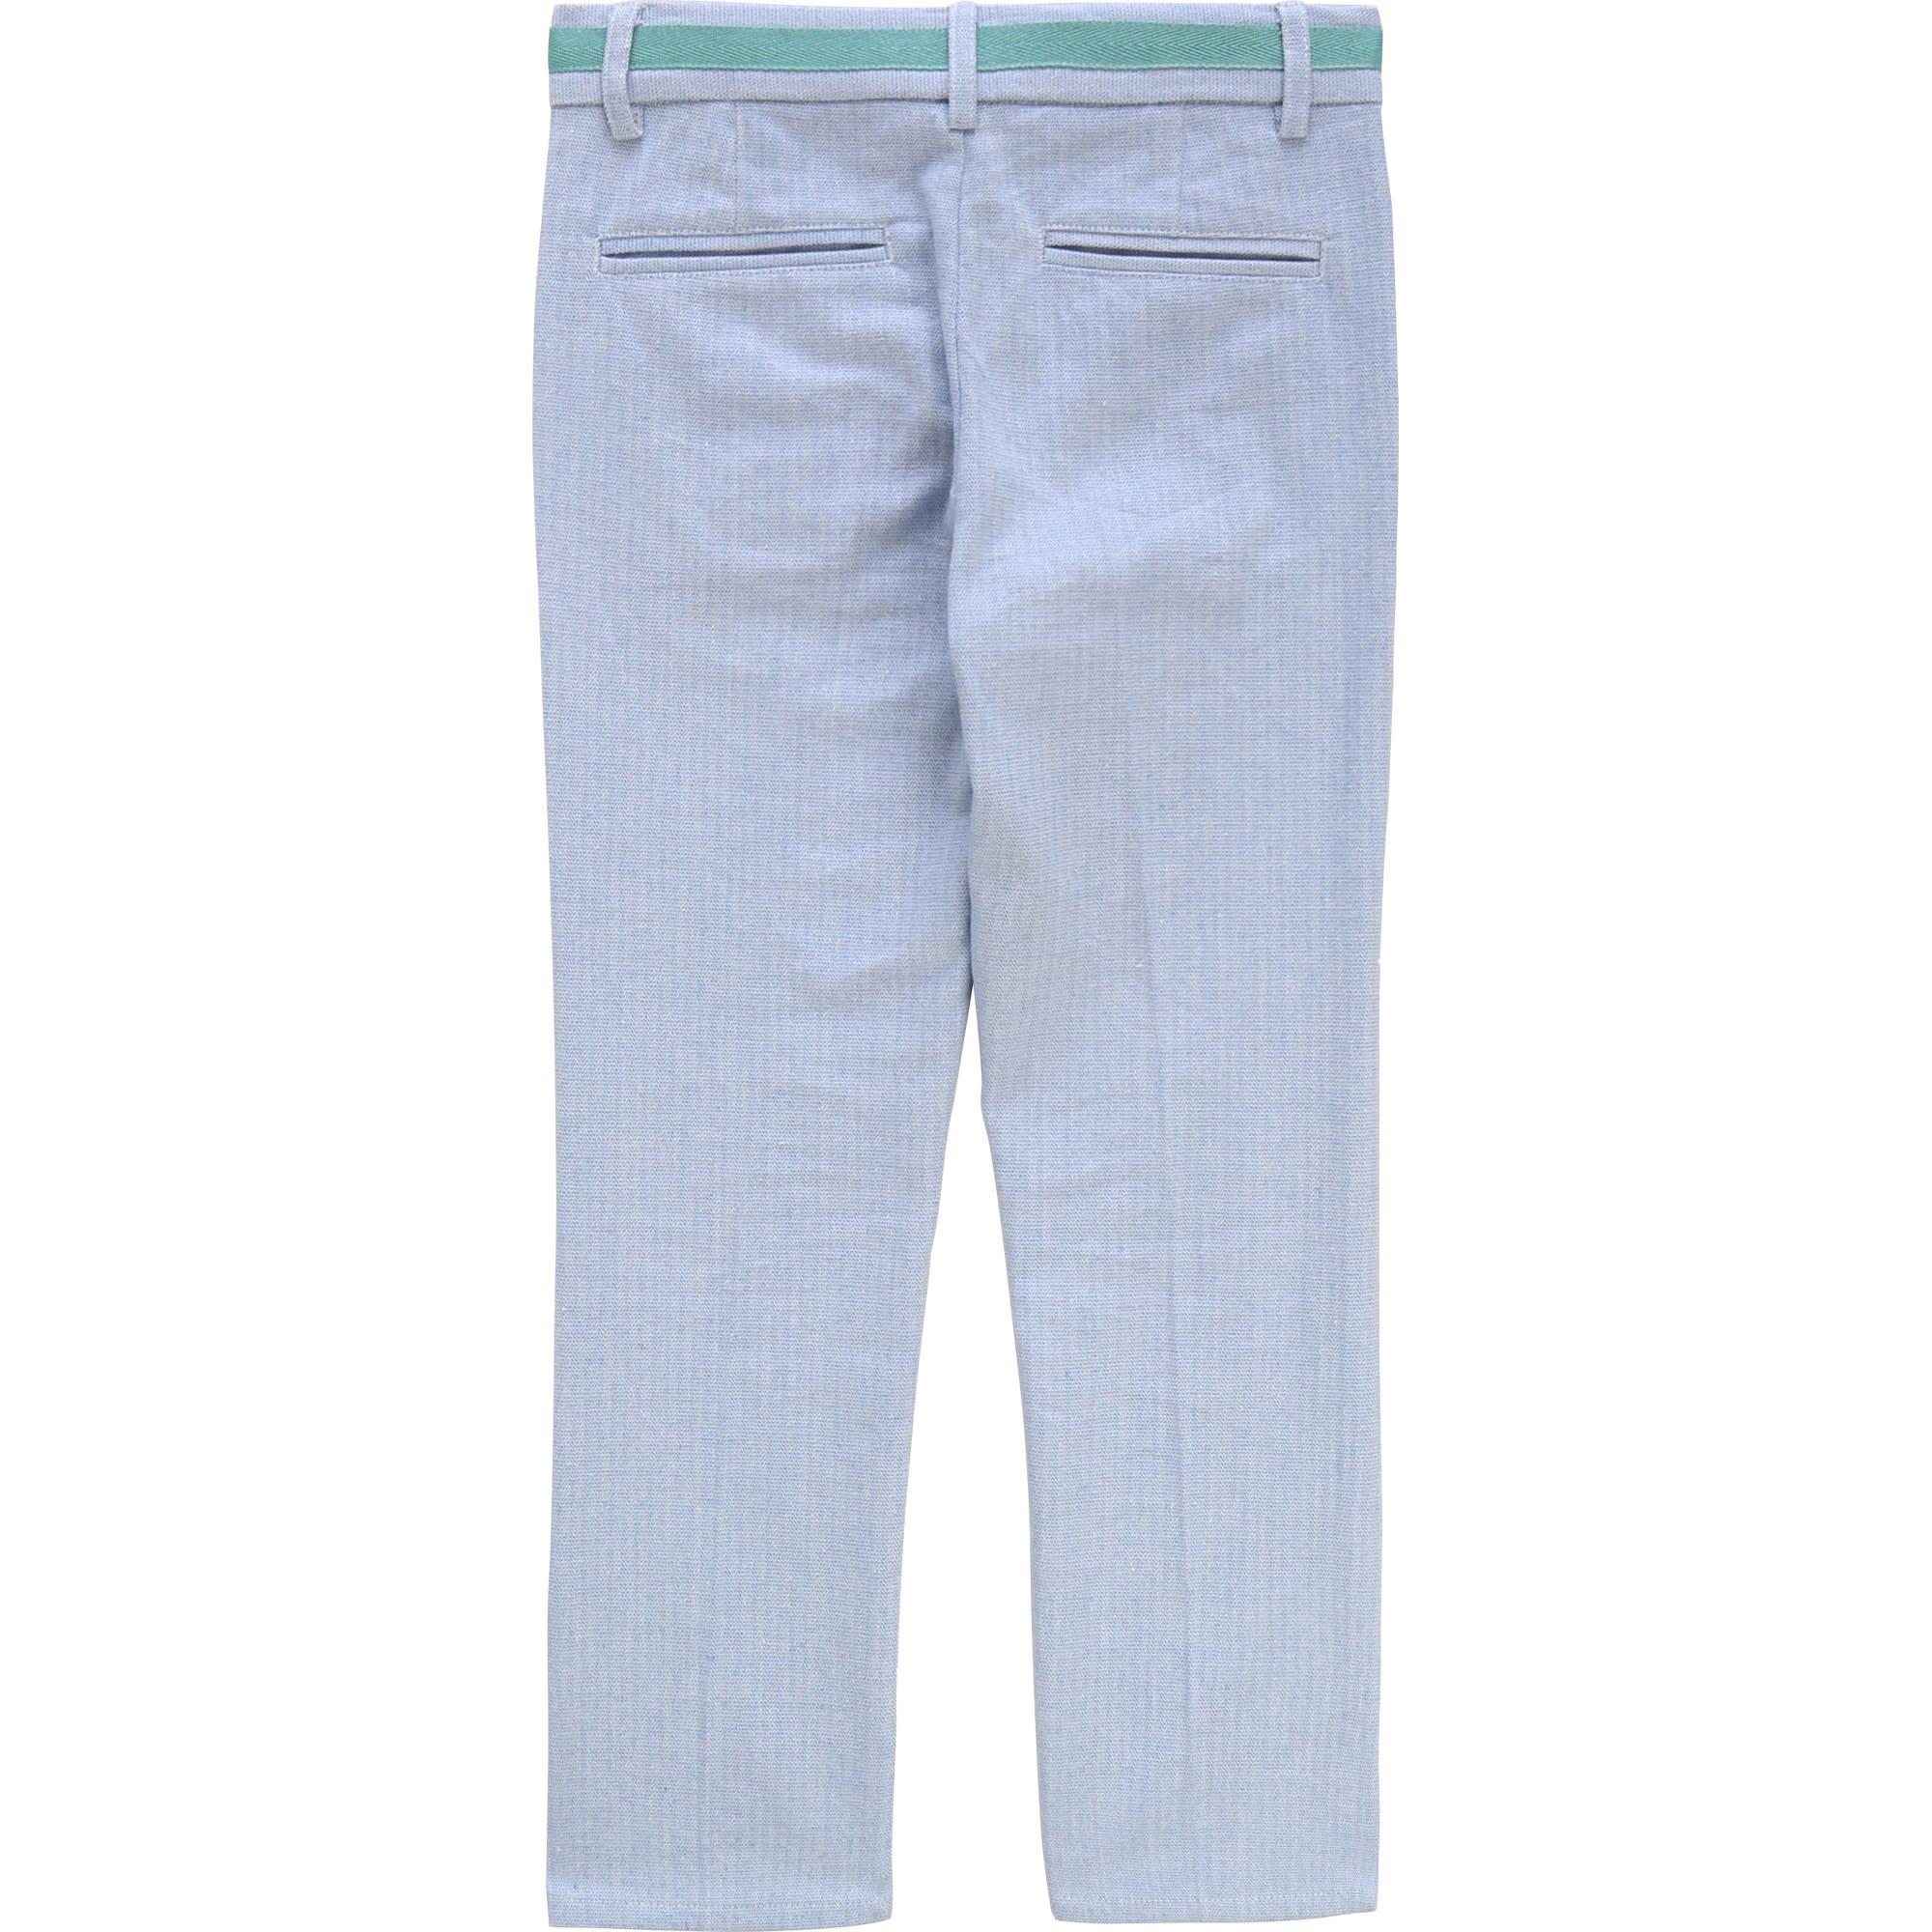 Billybandit Pantalon Gar/çon